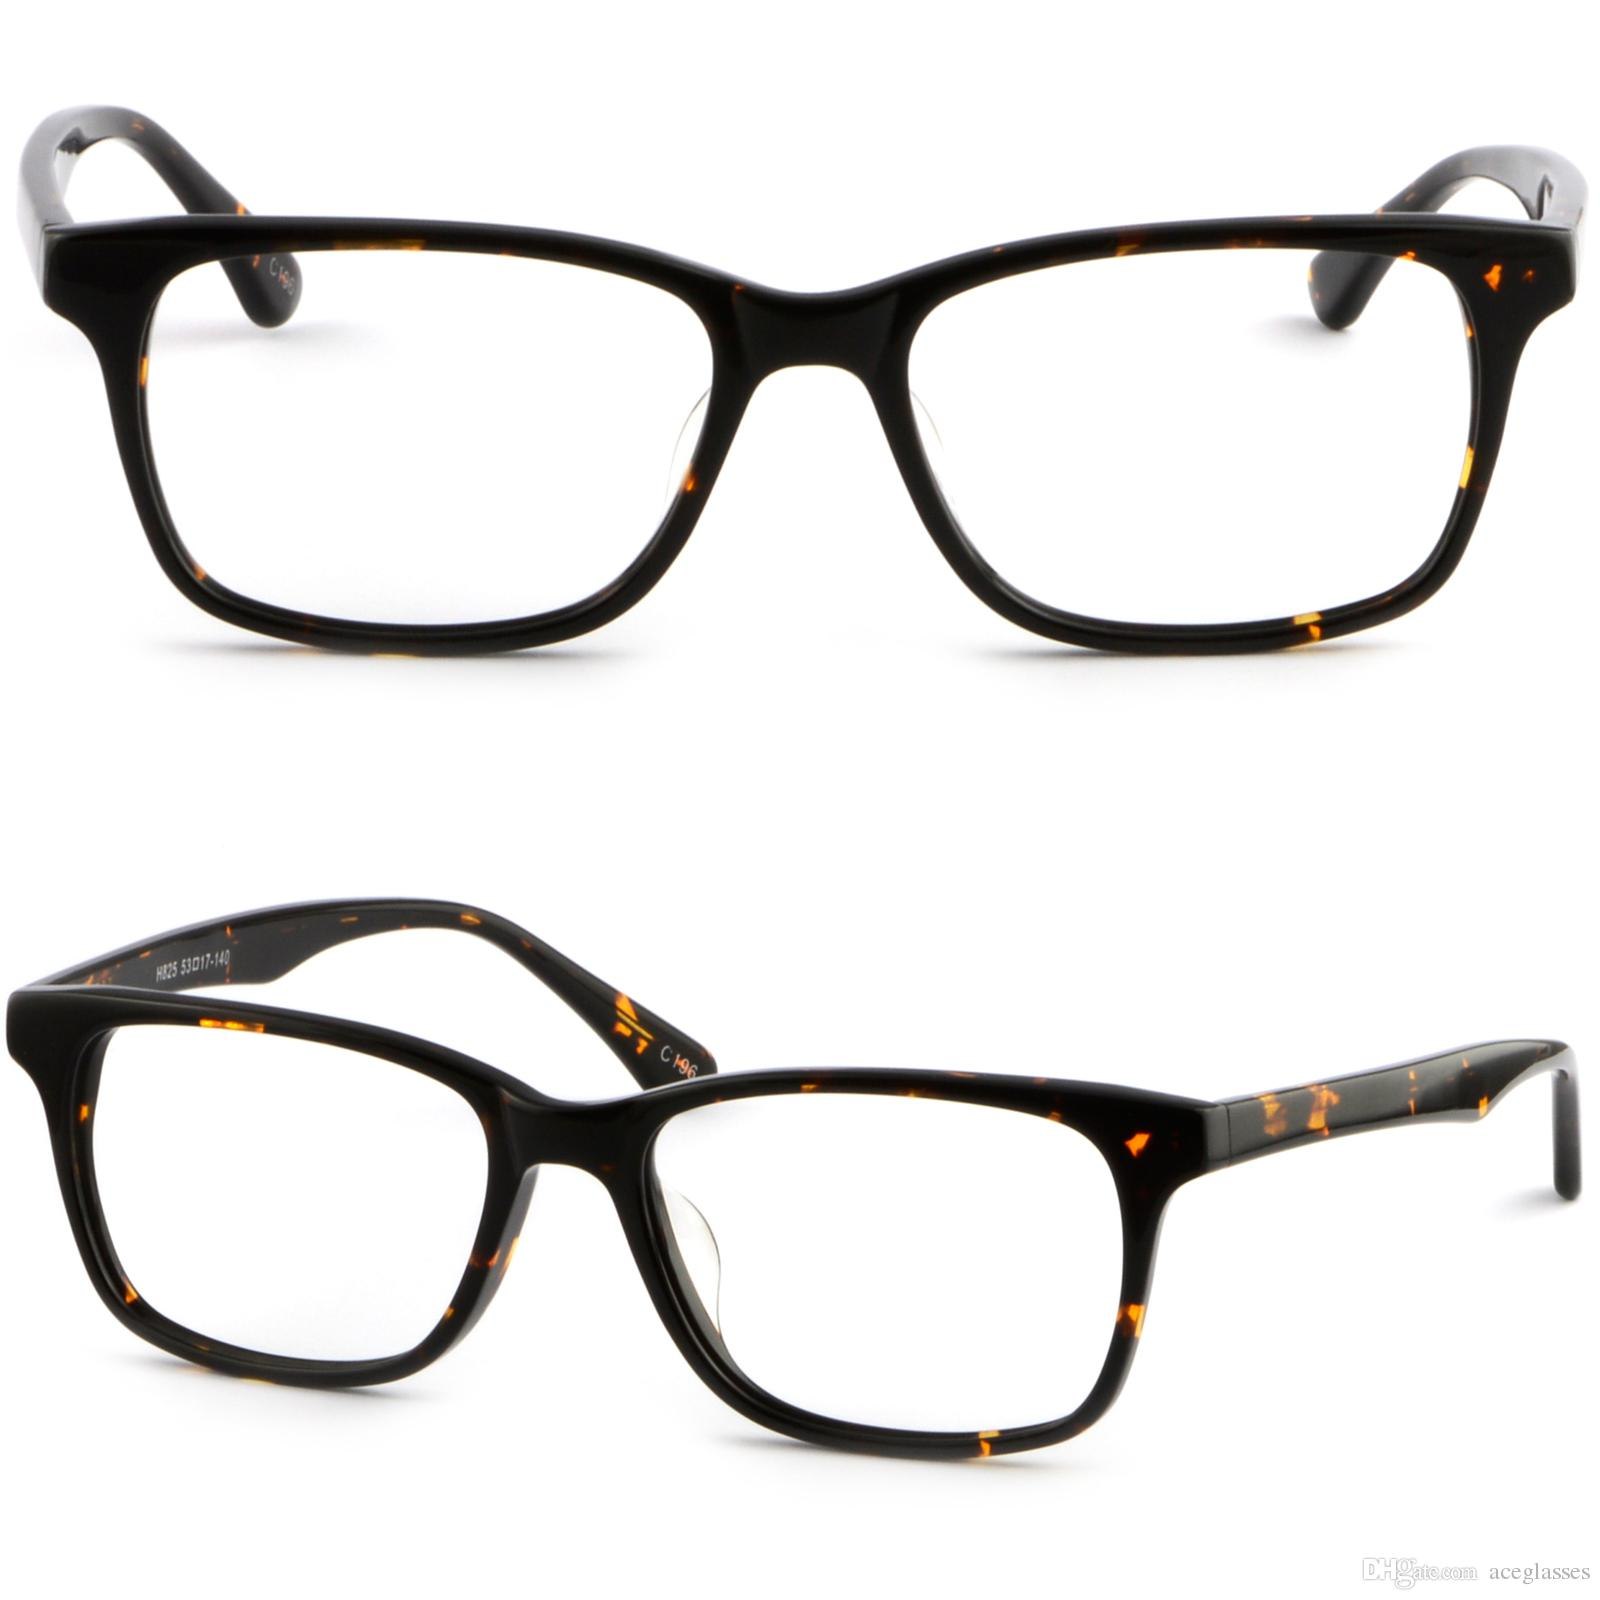 b16be4ed64 Black Tortoiseshell Square Men Women Plastic Frame Prescription Glasses  Sunglasses Wholesale Eyeglass Frames Wide Eyeglass Frames From Aceglasses